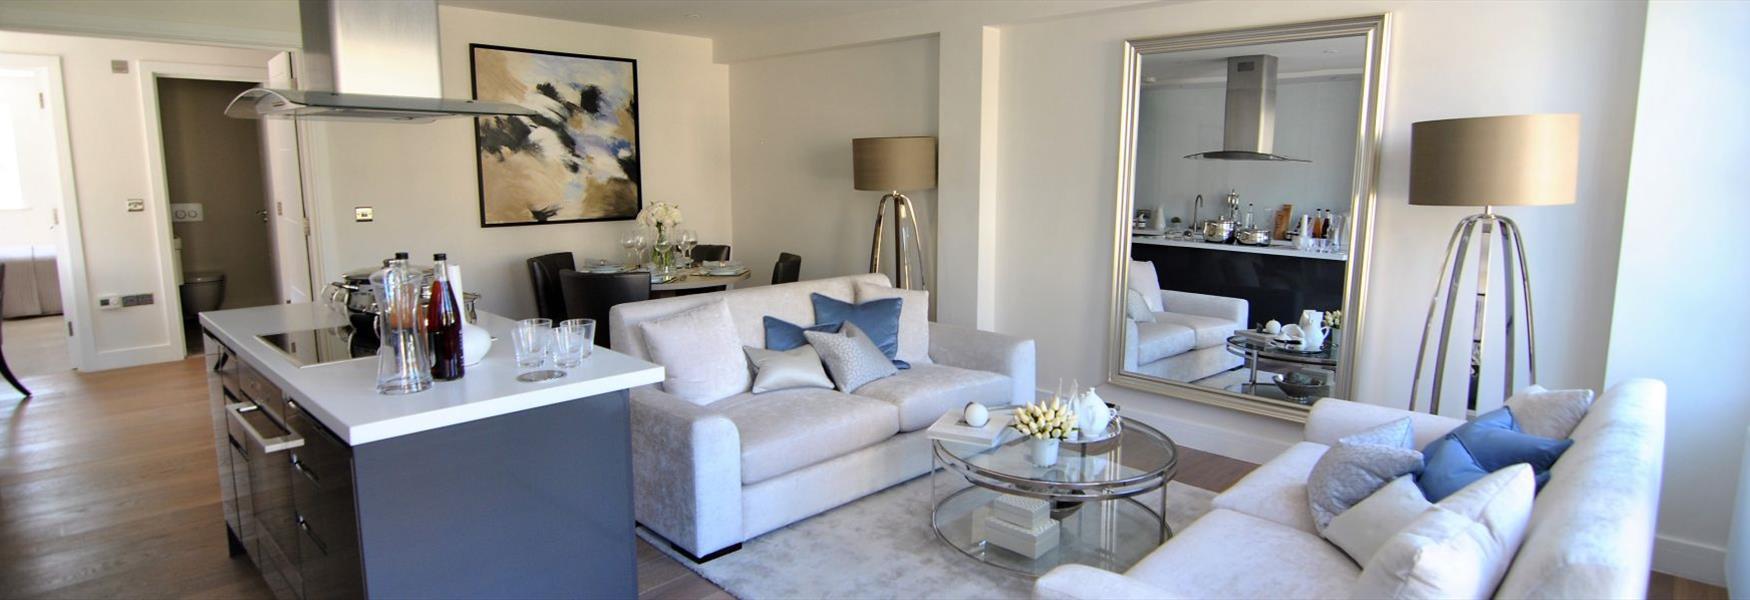 Accommodation Windsor Limited